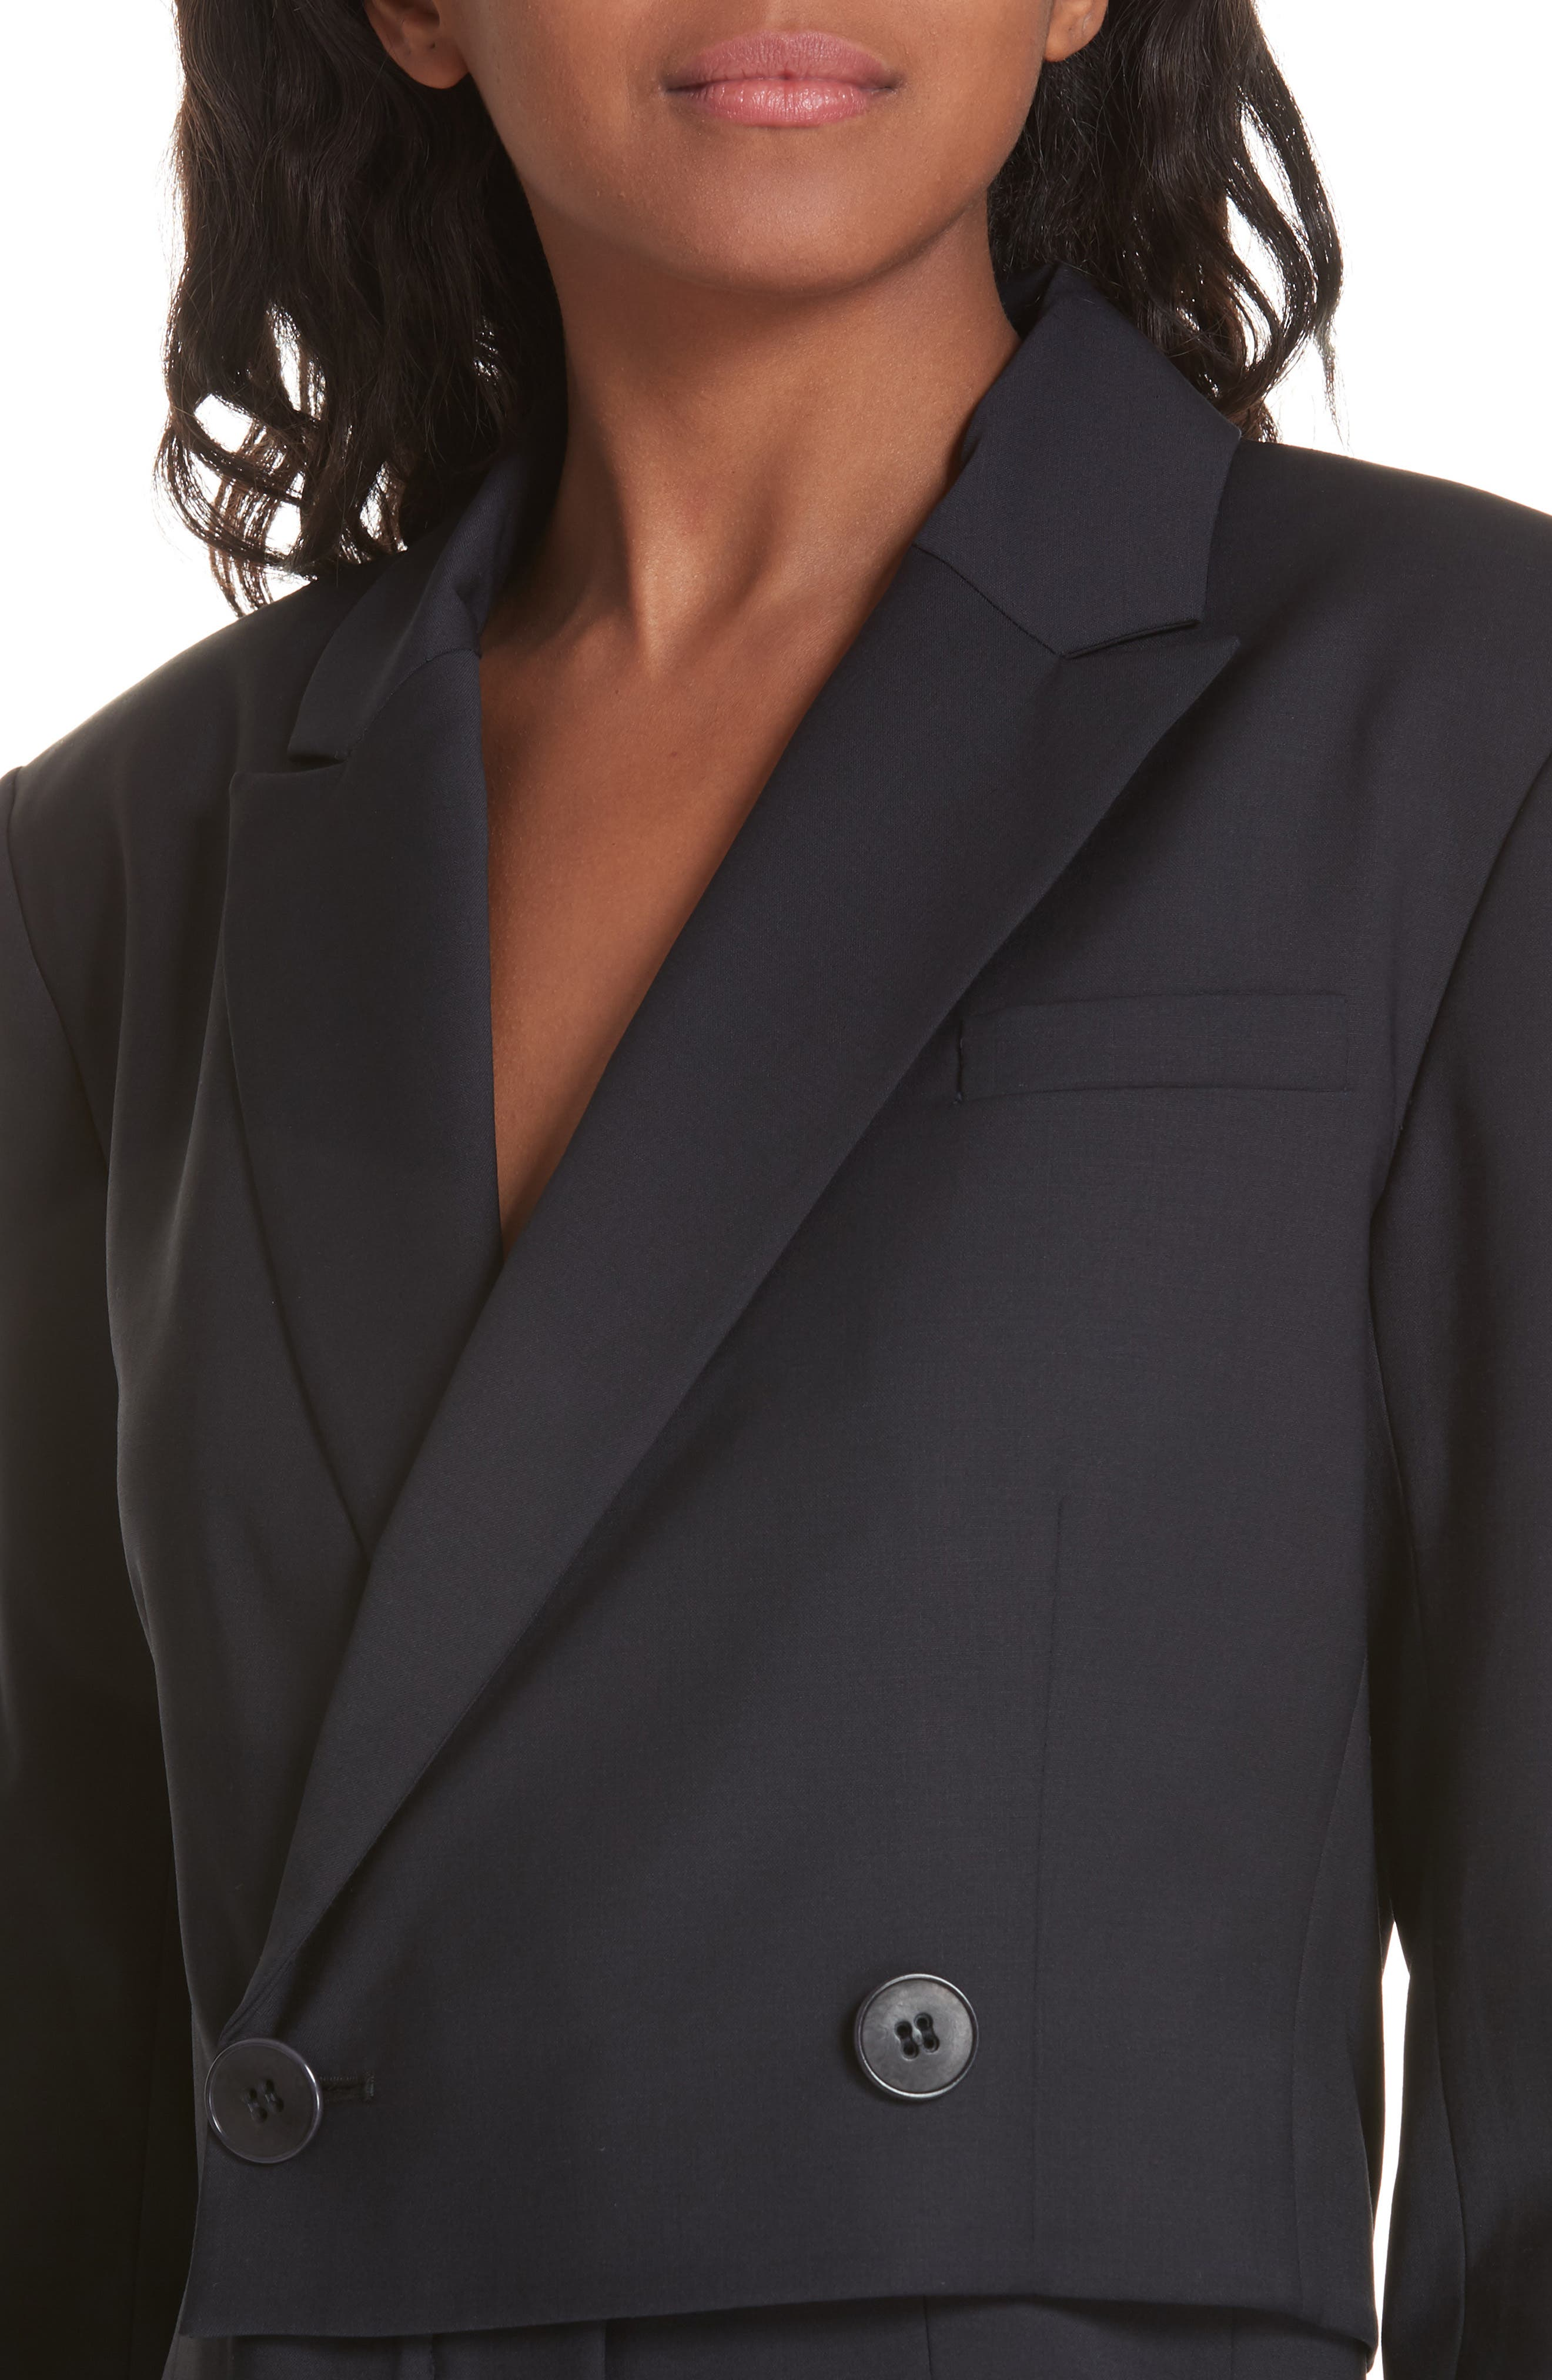 TIBI,                             Plain Weave Blazer Jumpsuit,                             Alternate thumbnail 5, color,                             DARK NAVY